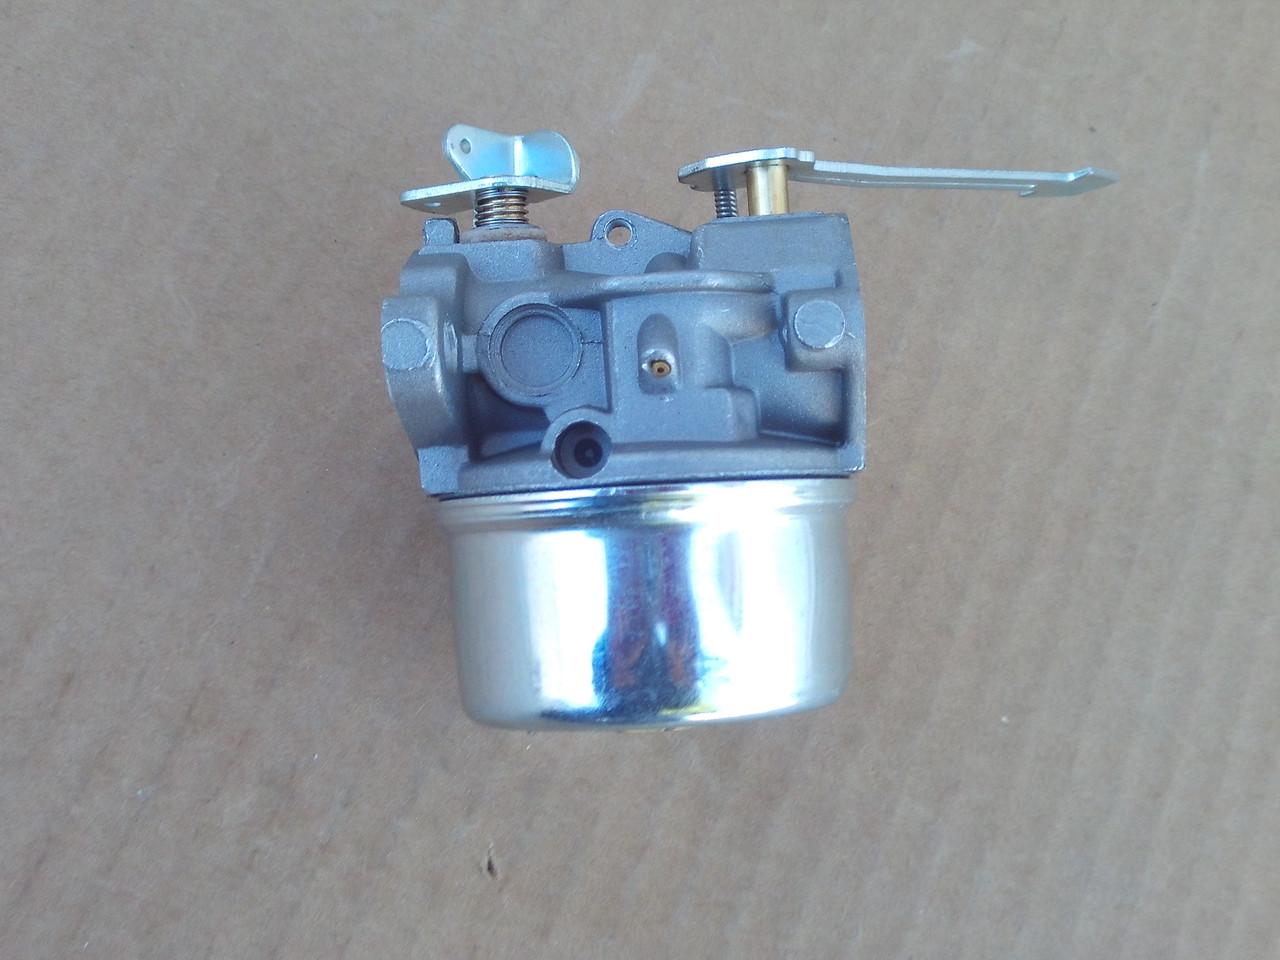 Carburetor for Toro 38400, 38405, 38190, 38195, 38182, 38172, 38173 Snow blower 632552, 640086, 640086A